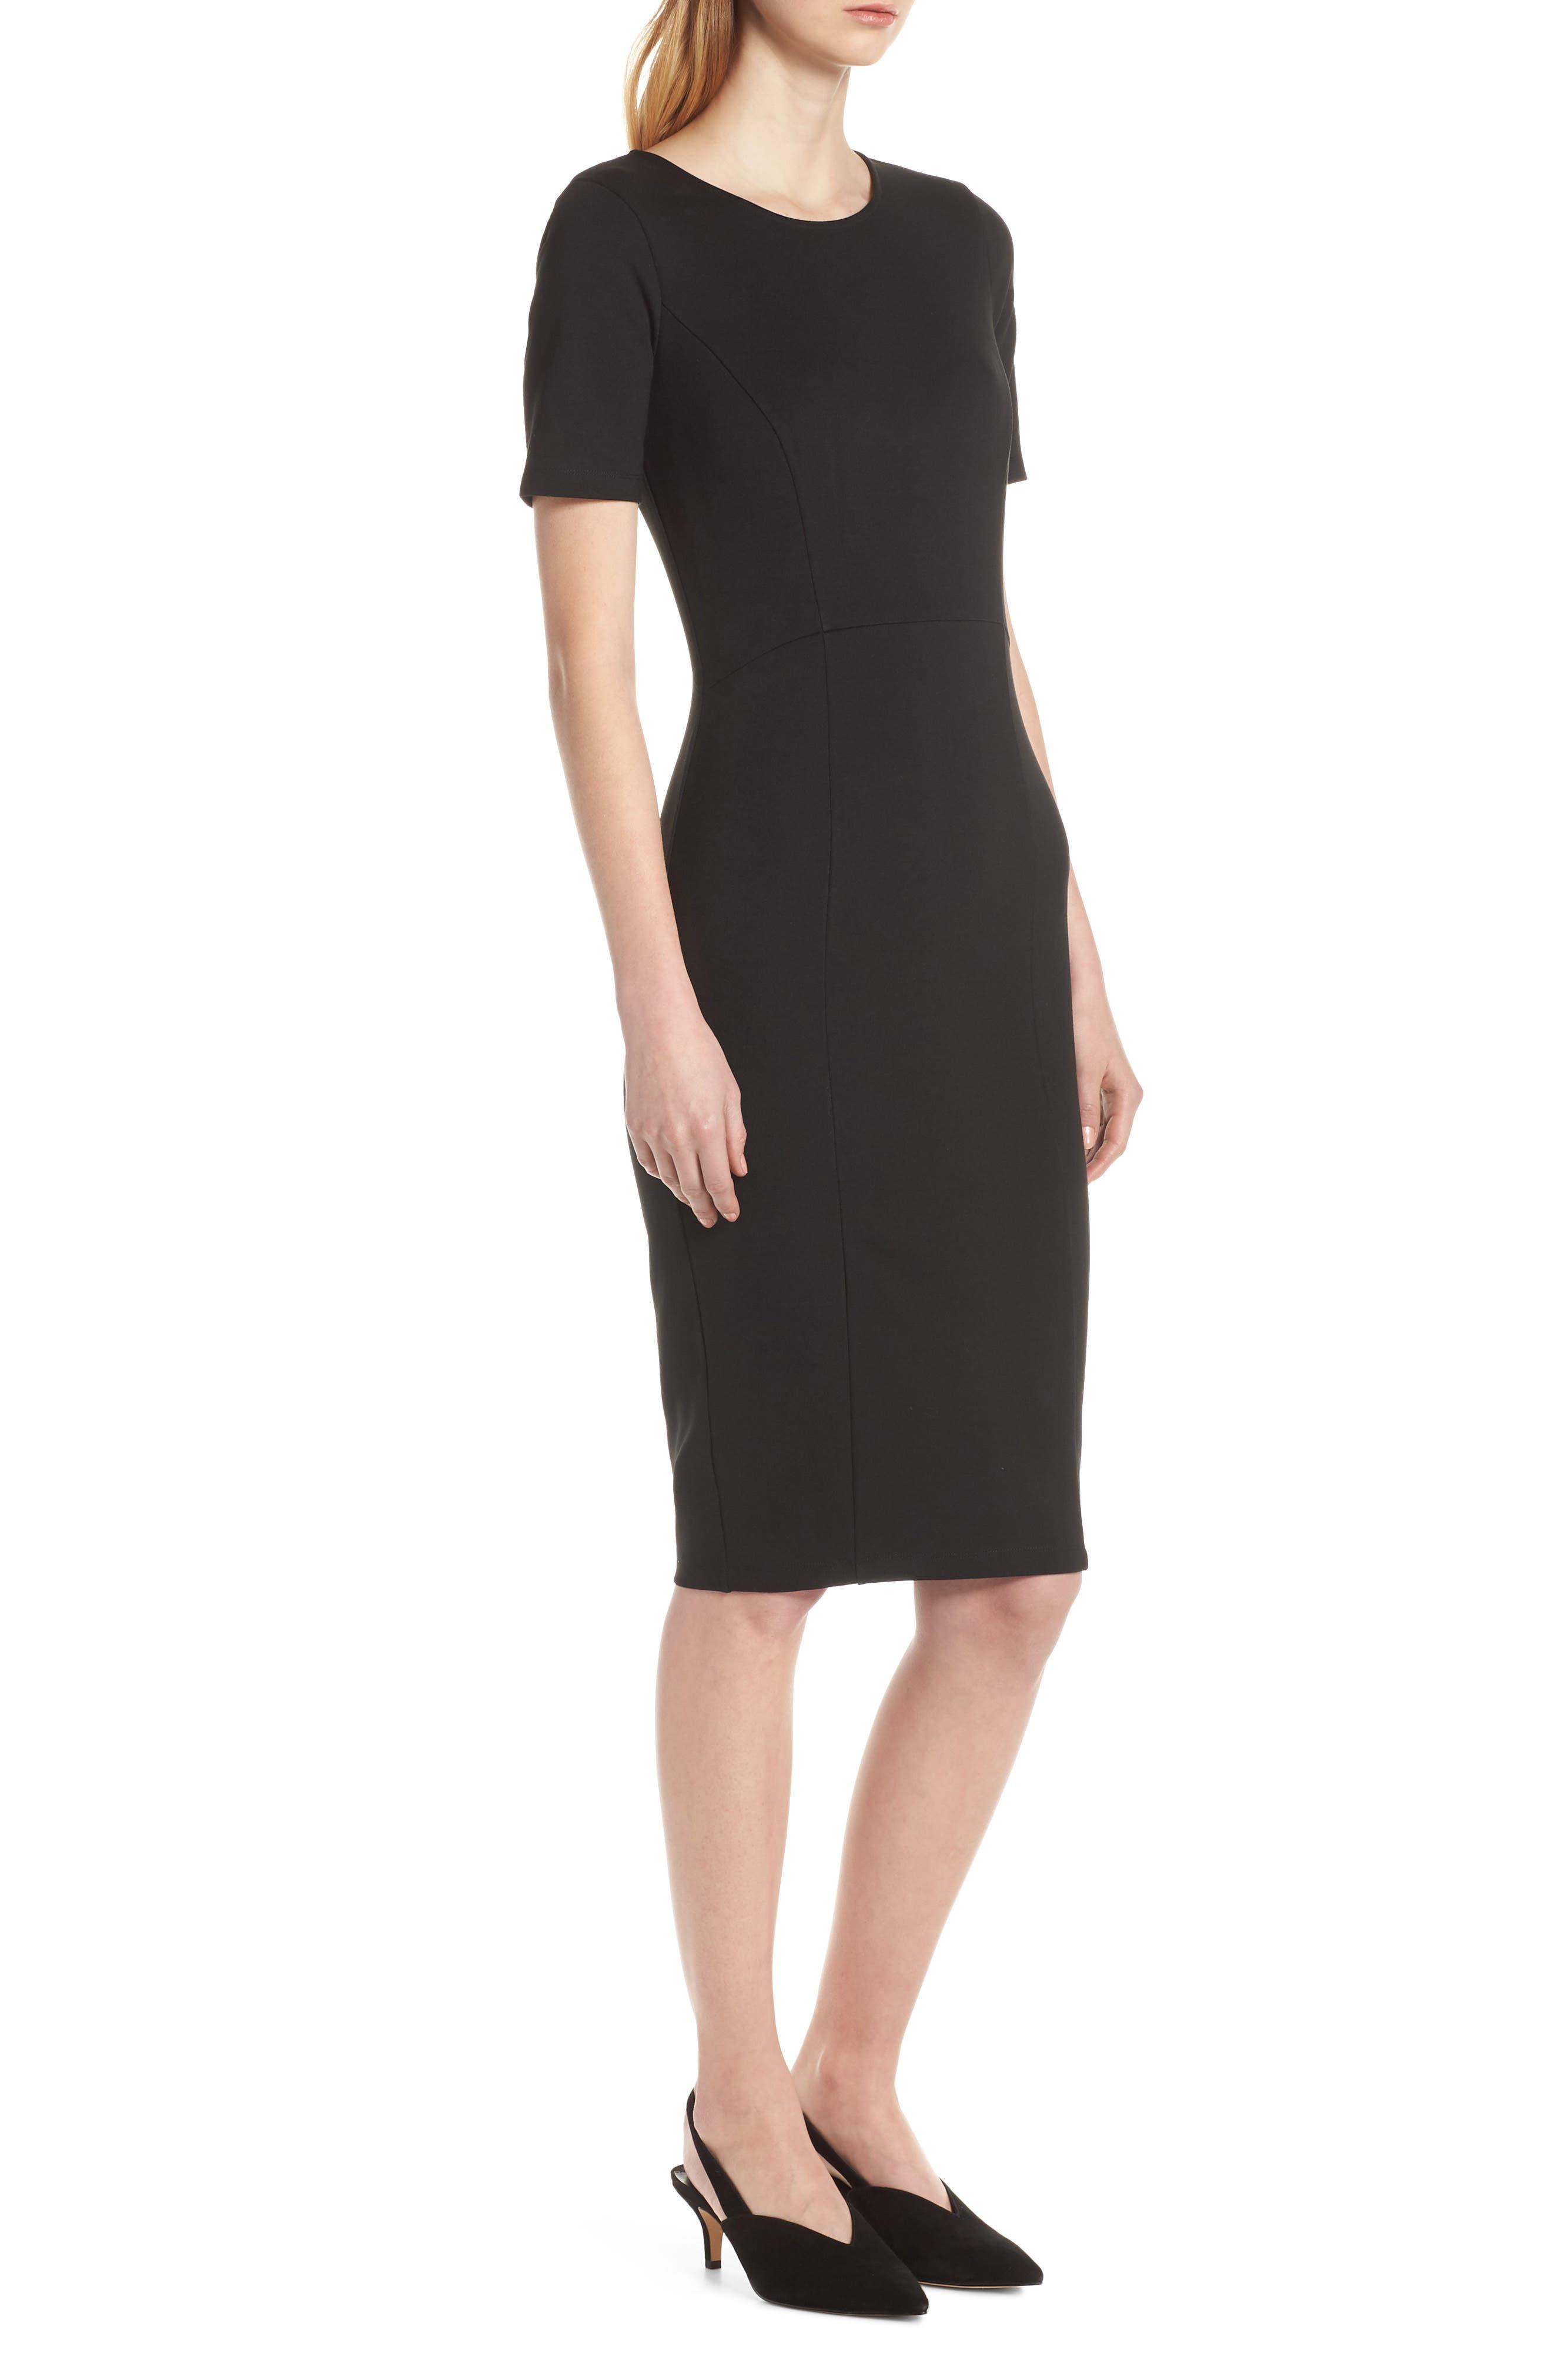 ALI & JAY, Zip Back Sheath Dress, Alternate thumbnail 4, color, BLACK